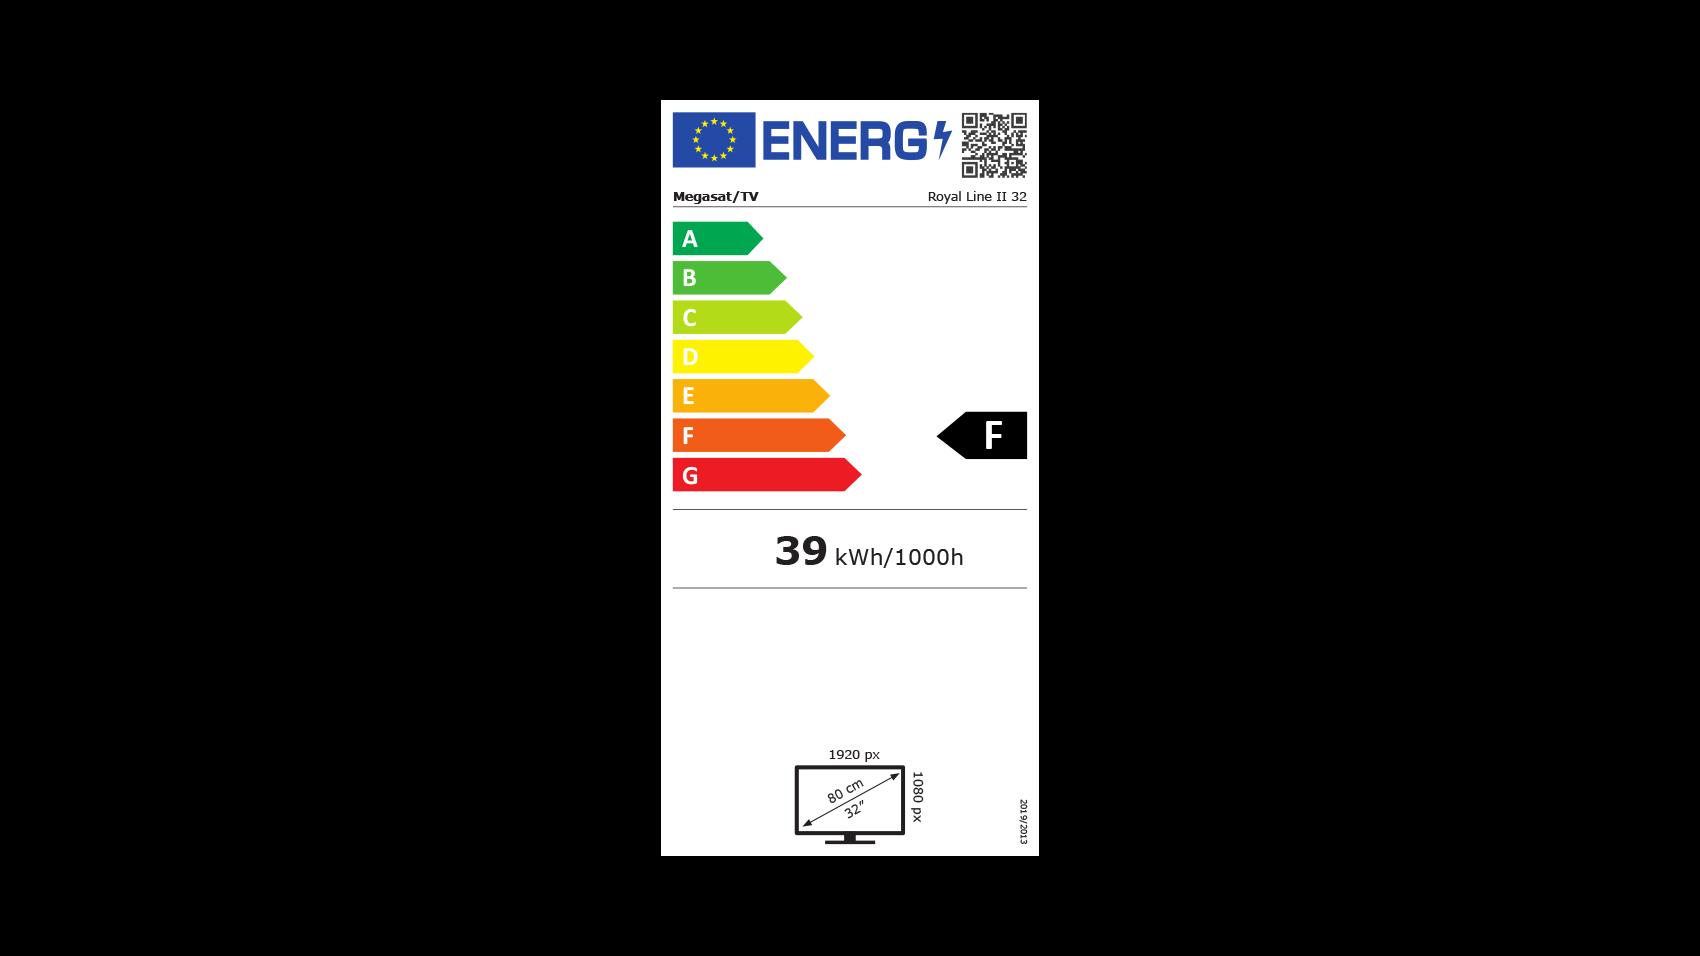 megasat_royal_line_2_32_energielabel_2021